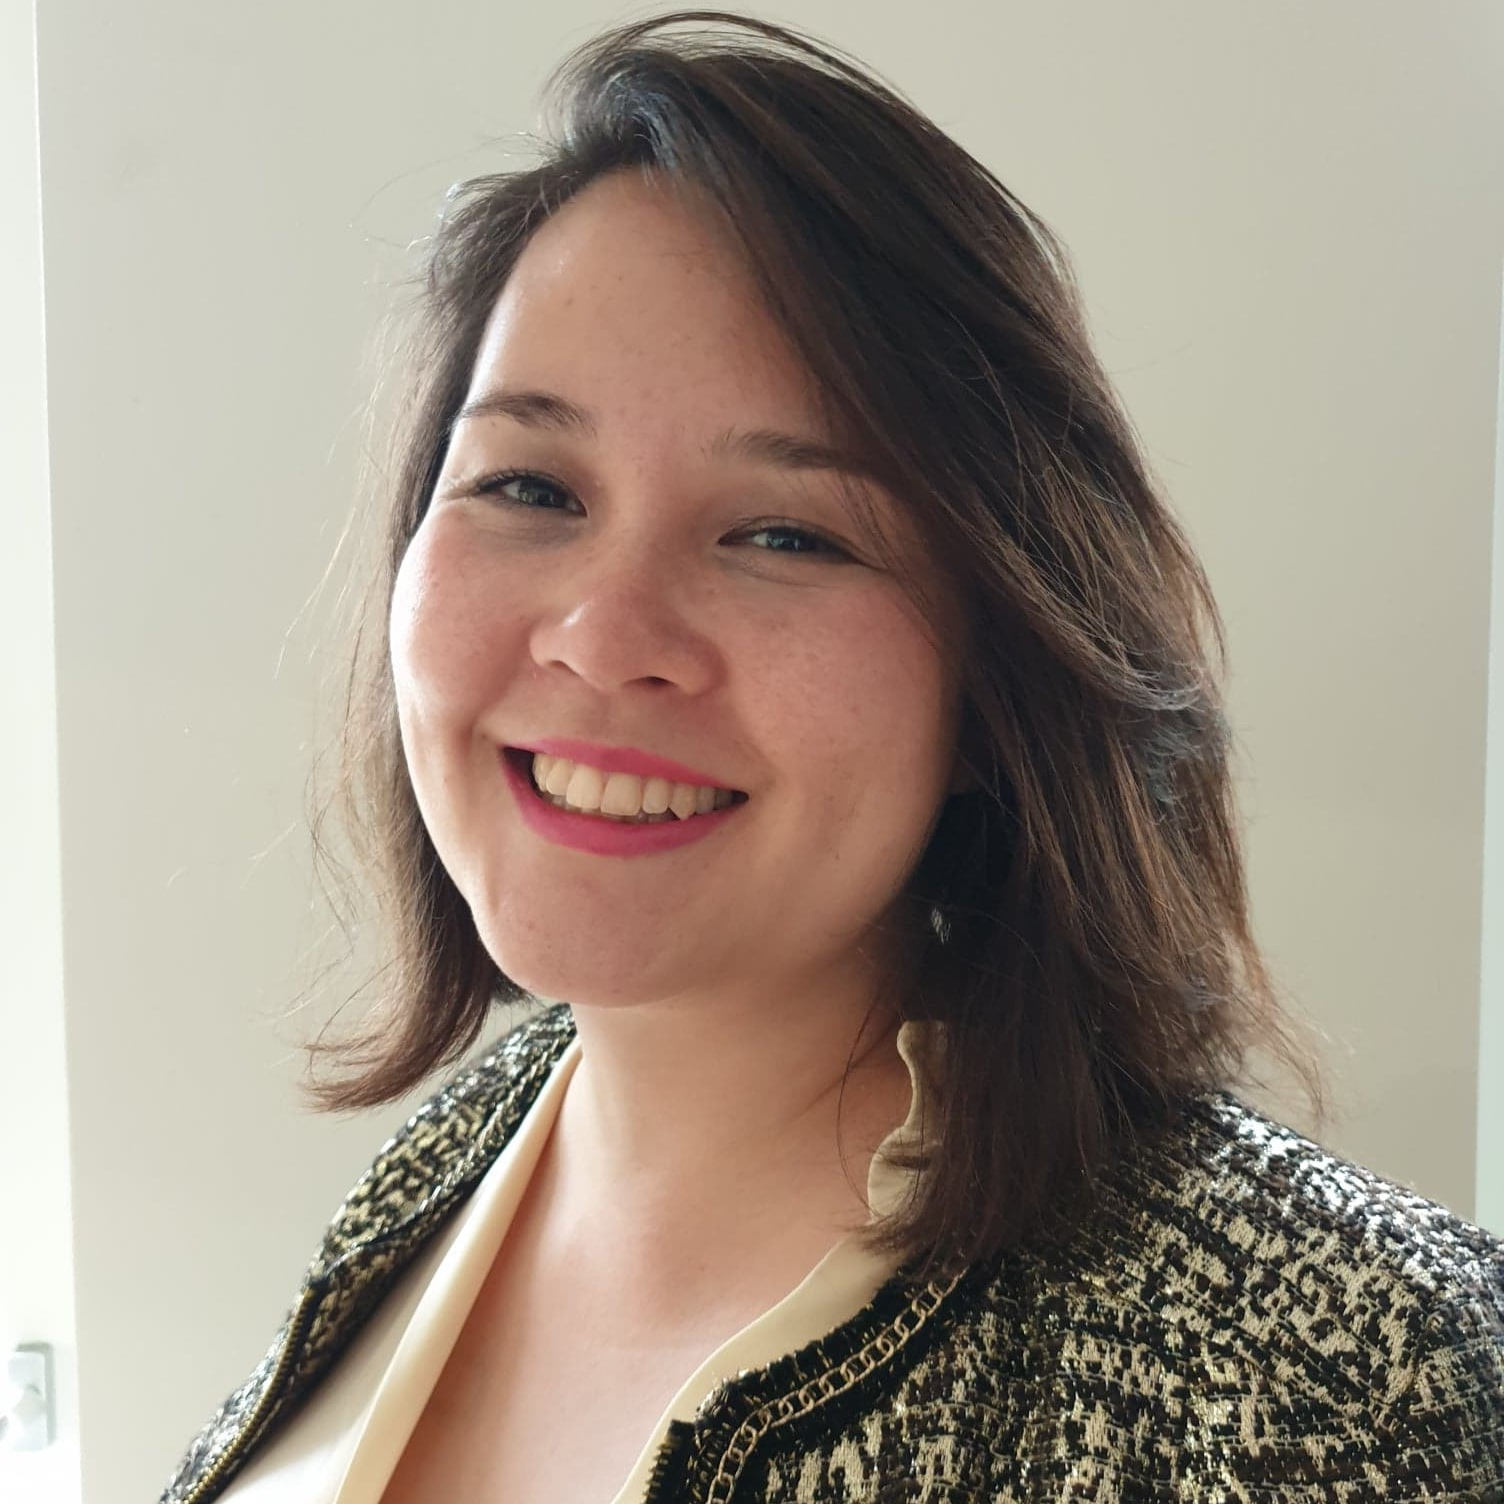 Sarah Kok - Podcast co-host and Head of Partnerships